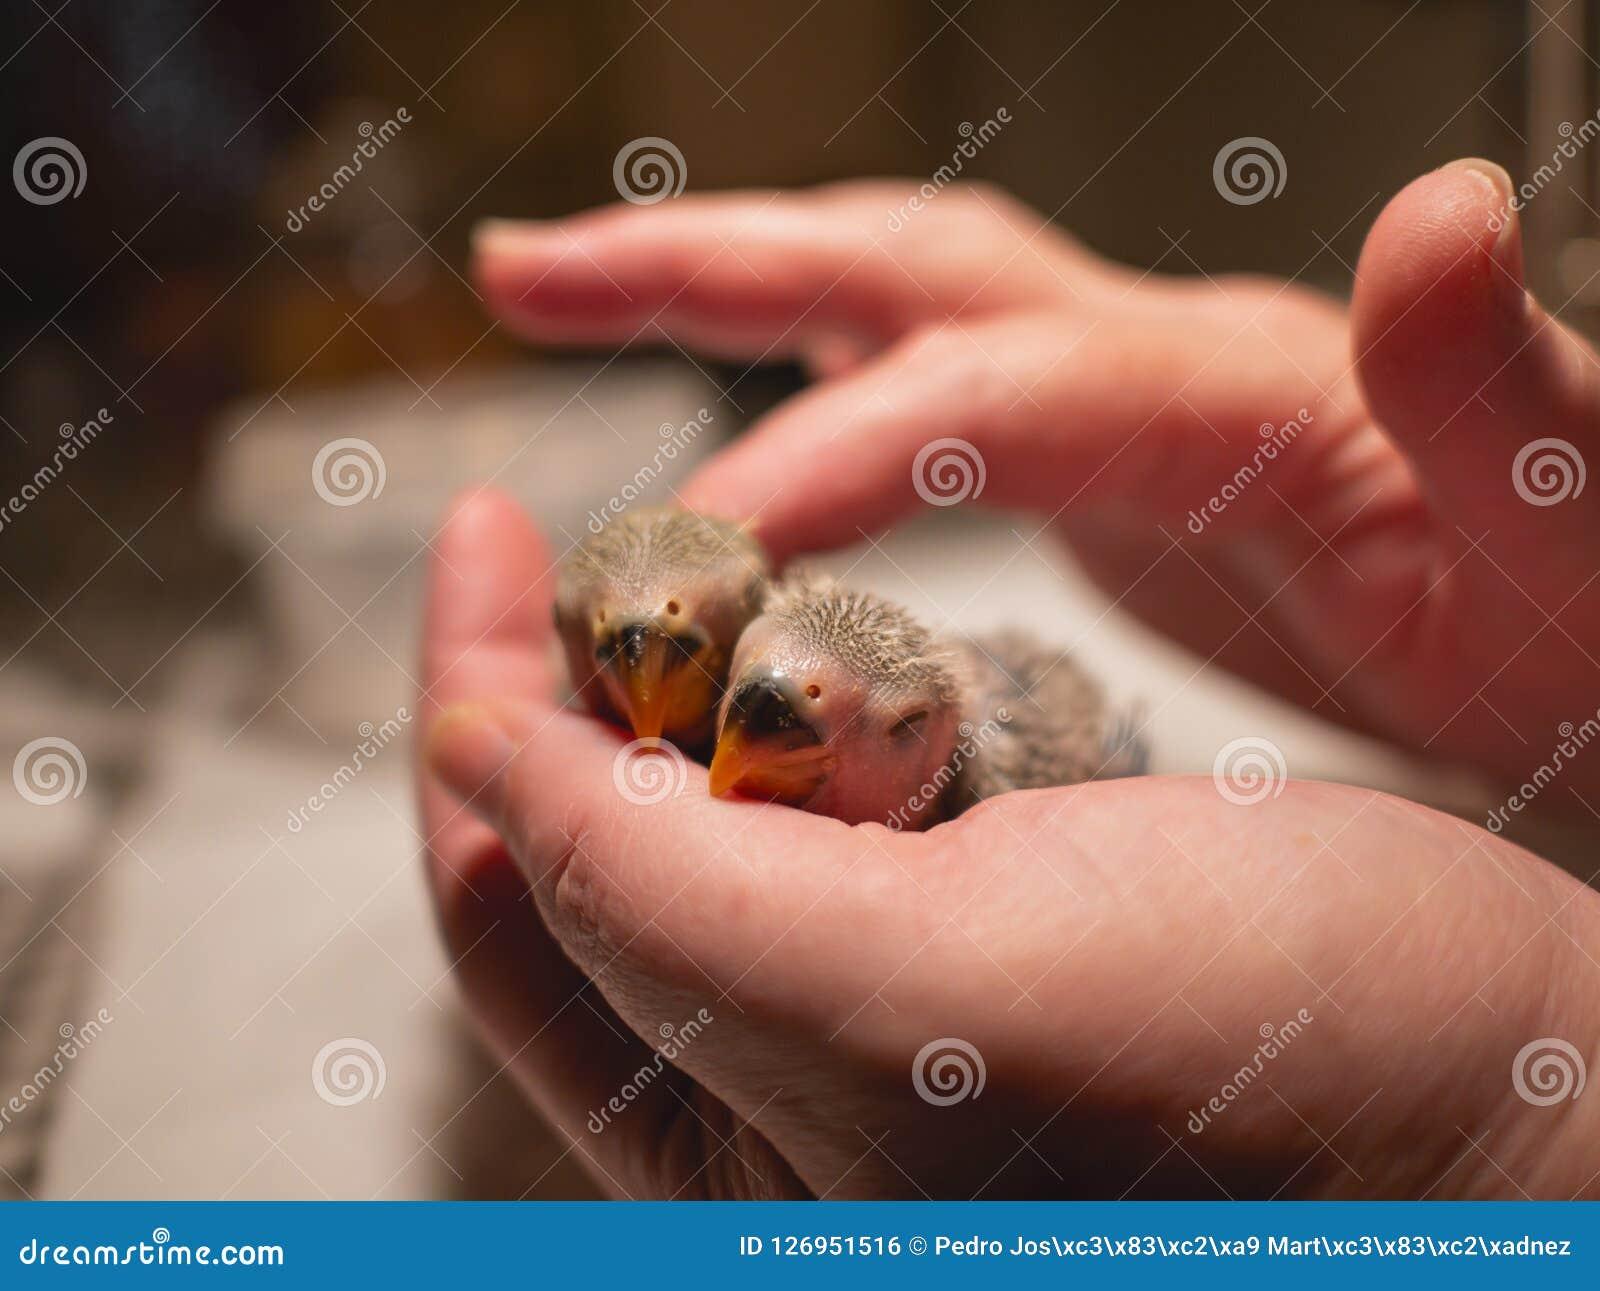 Pair of newborn lovebirds in hand and finger caress. Closeup.